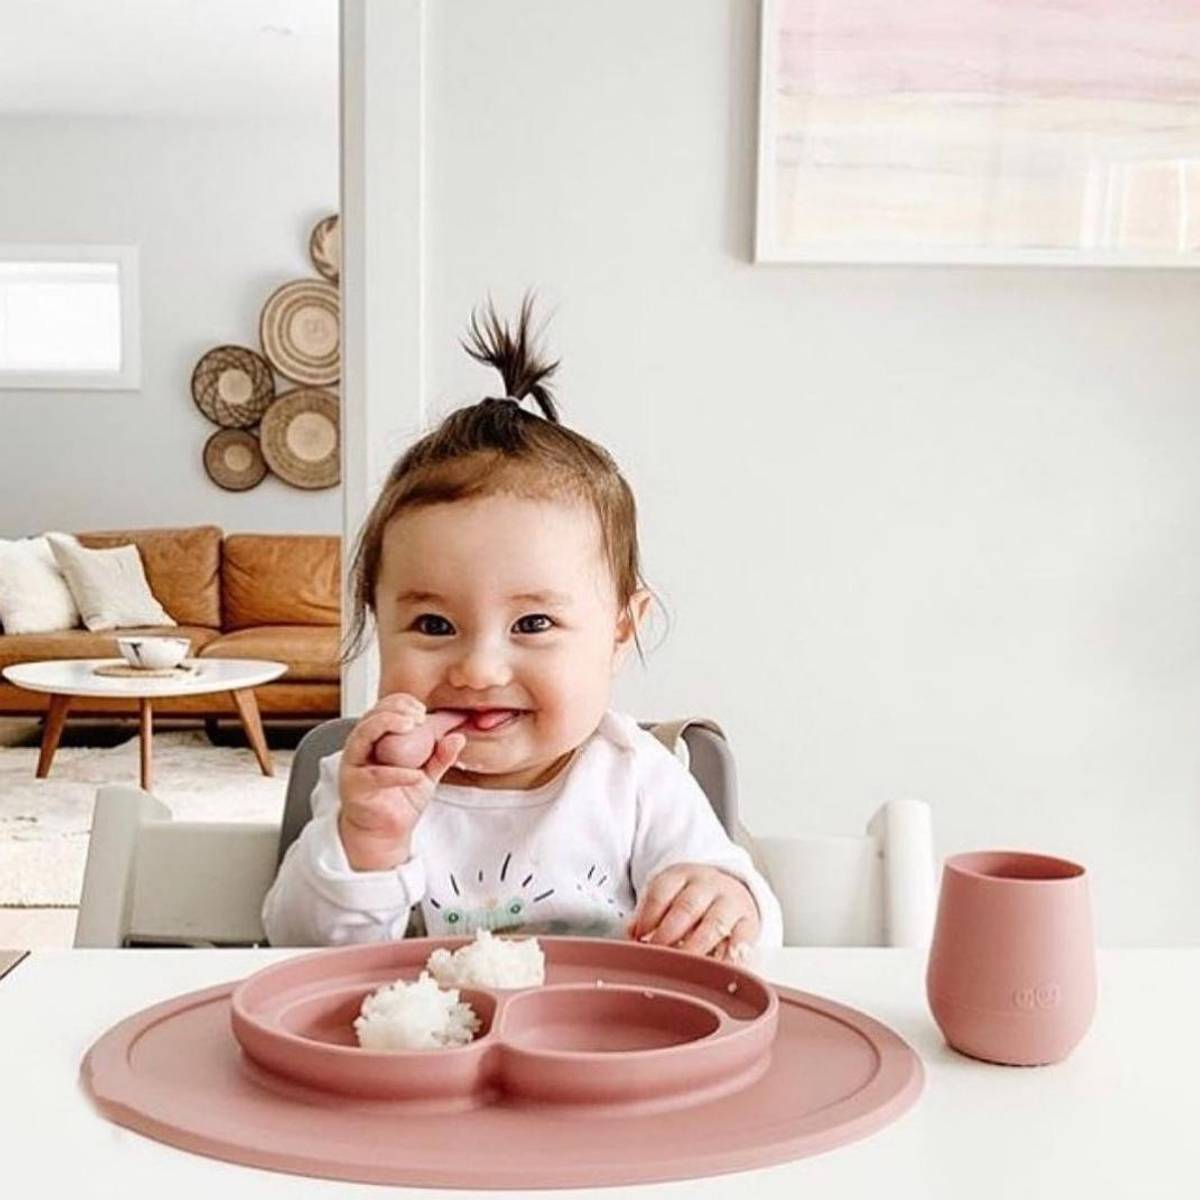 Ezpz - Babyskje i Silikon 2pk - Blush